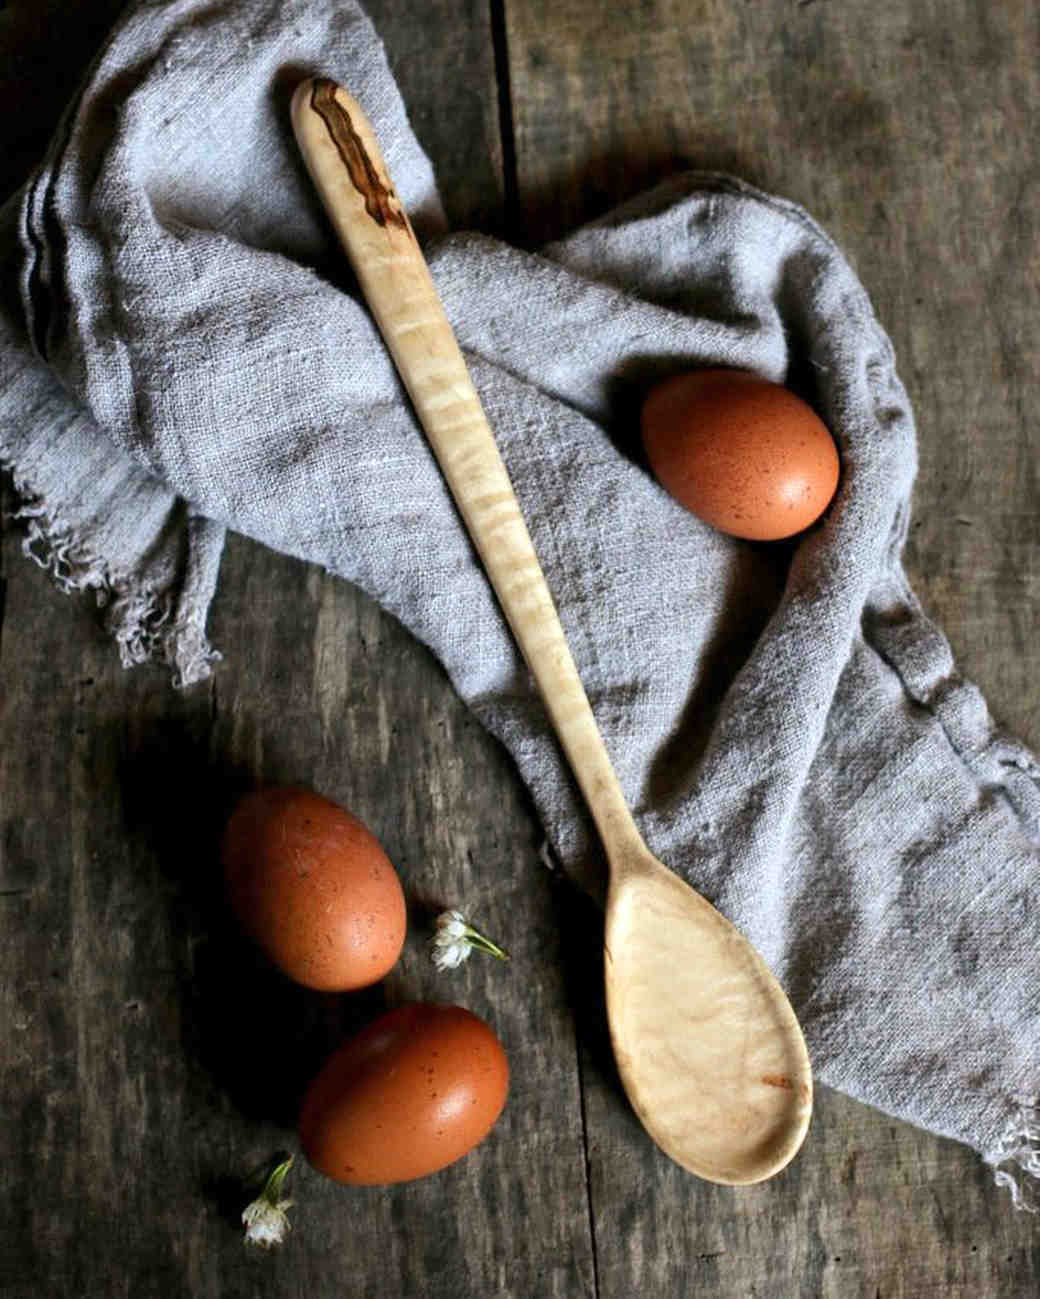 wood anniversary gift spoon tomatoes towel